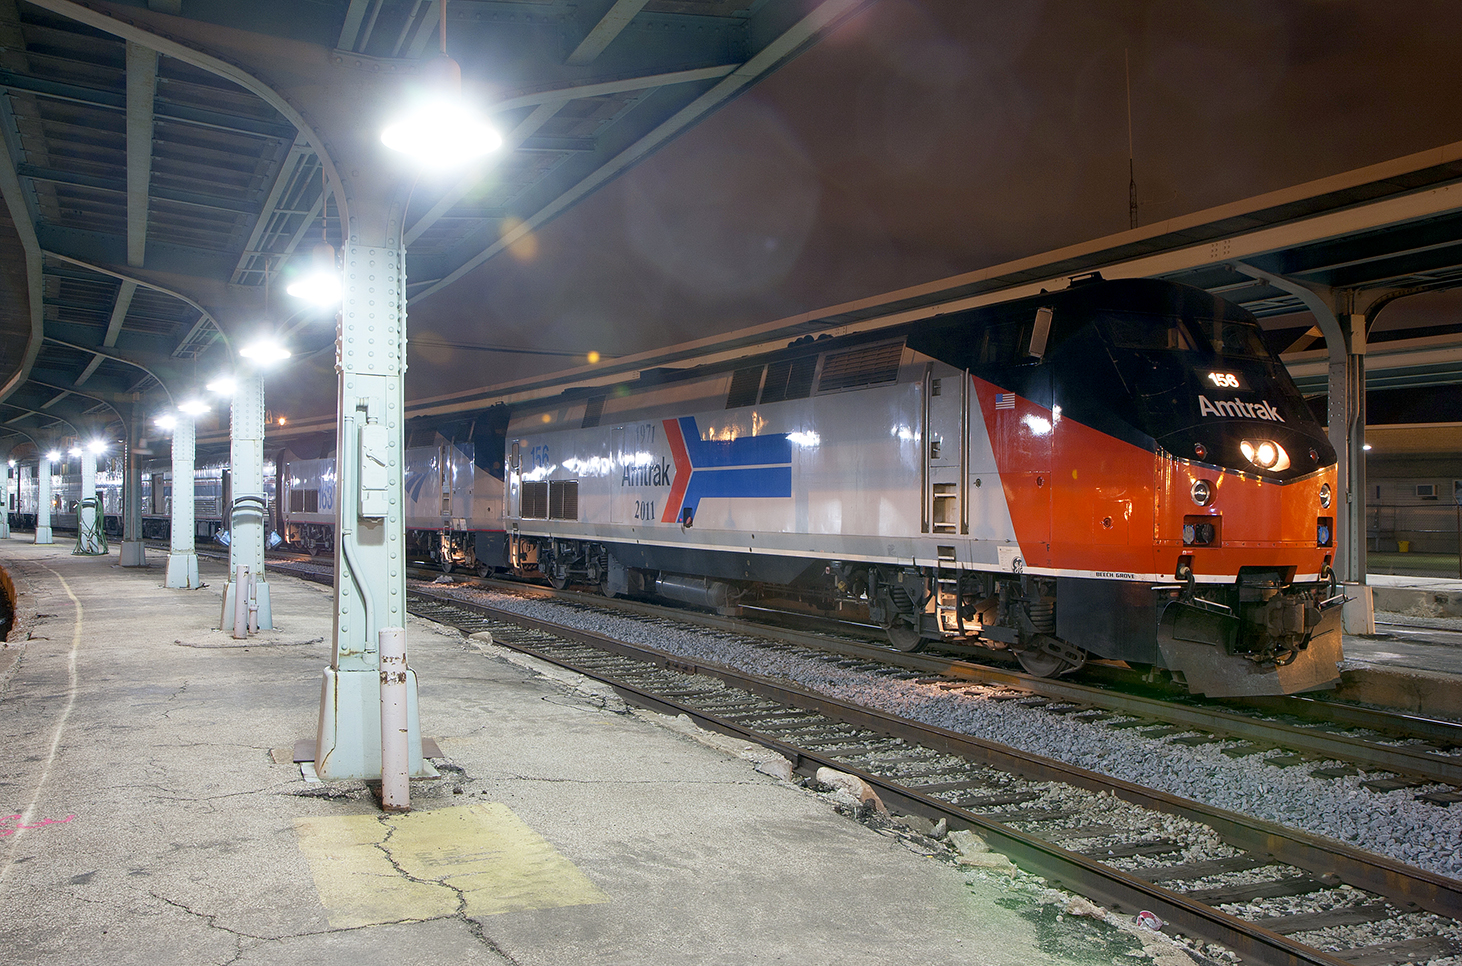 Amtrak Travel Reports & Photos plus TrainWeb hosted web sites featuring Amtrak travel reports.